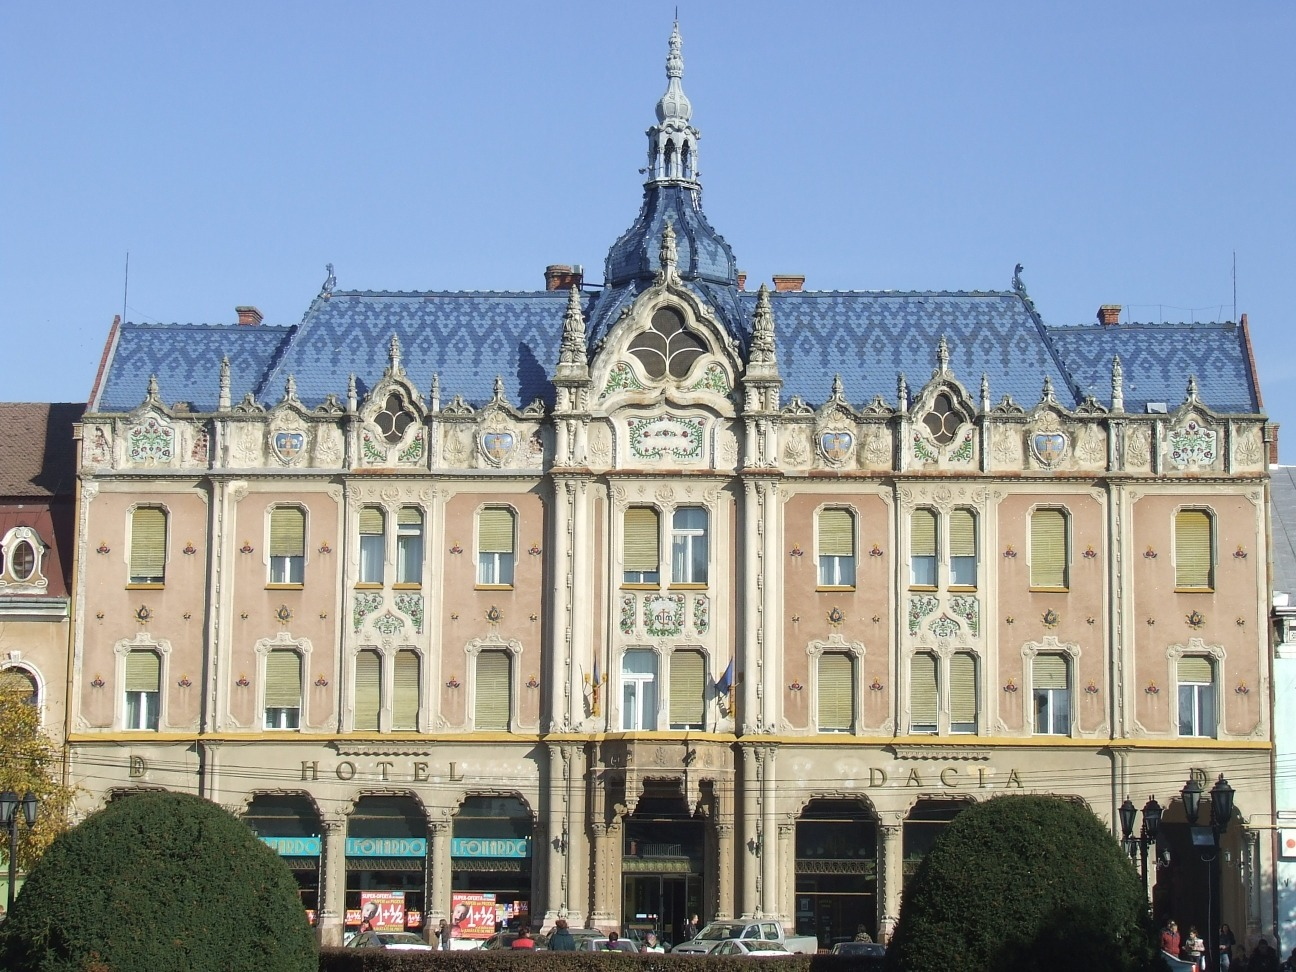 FOTO: Roamata/Wikimedia Commons